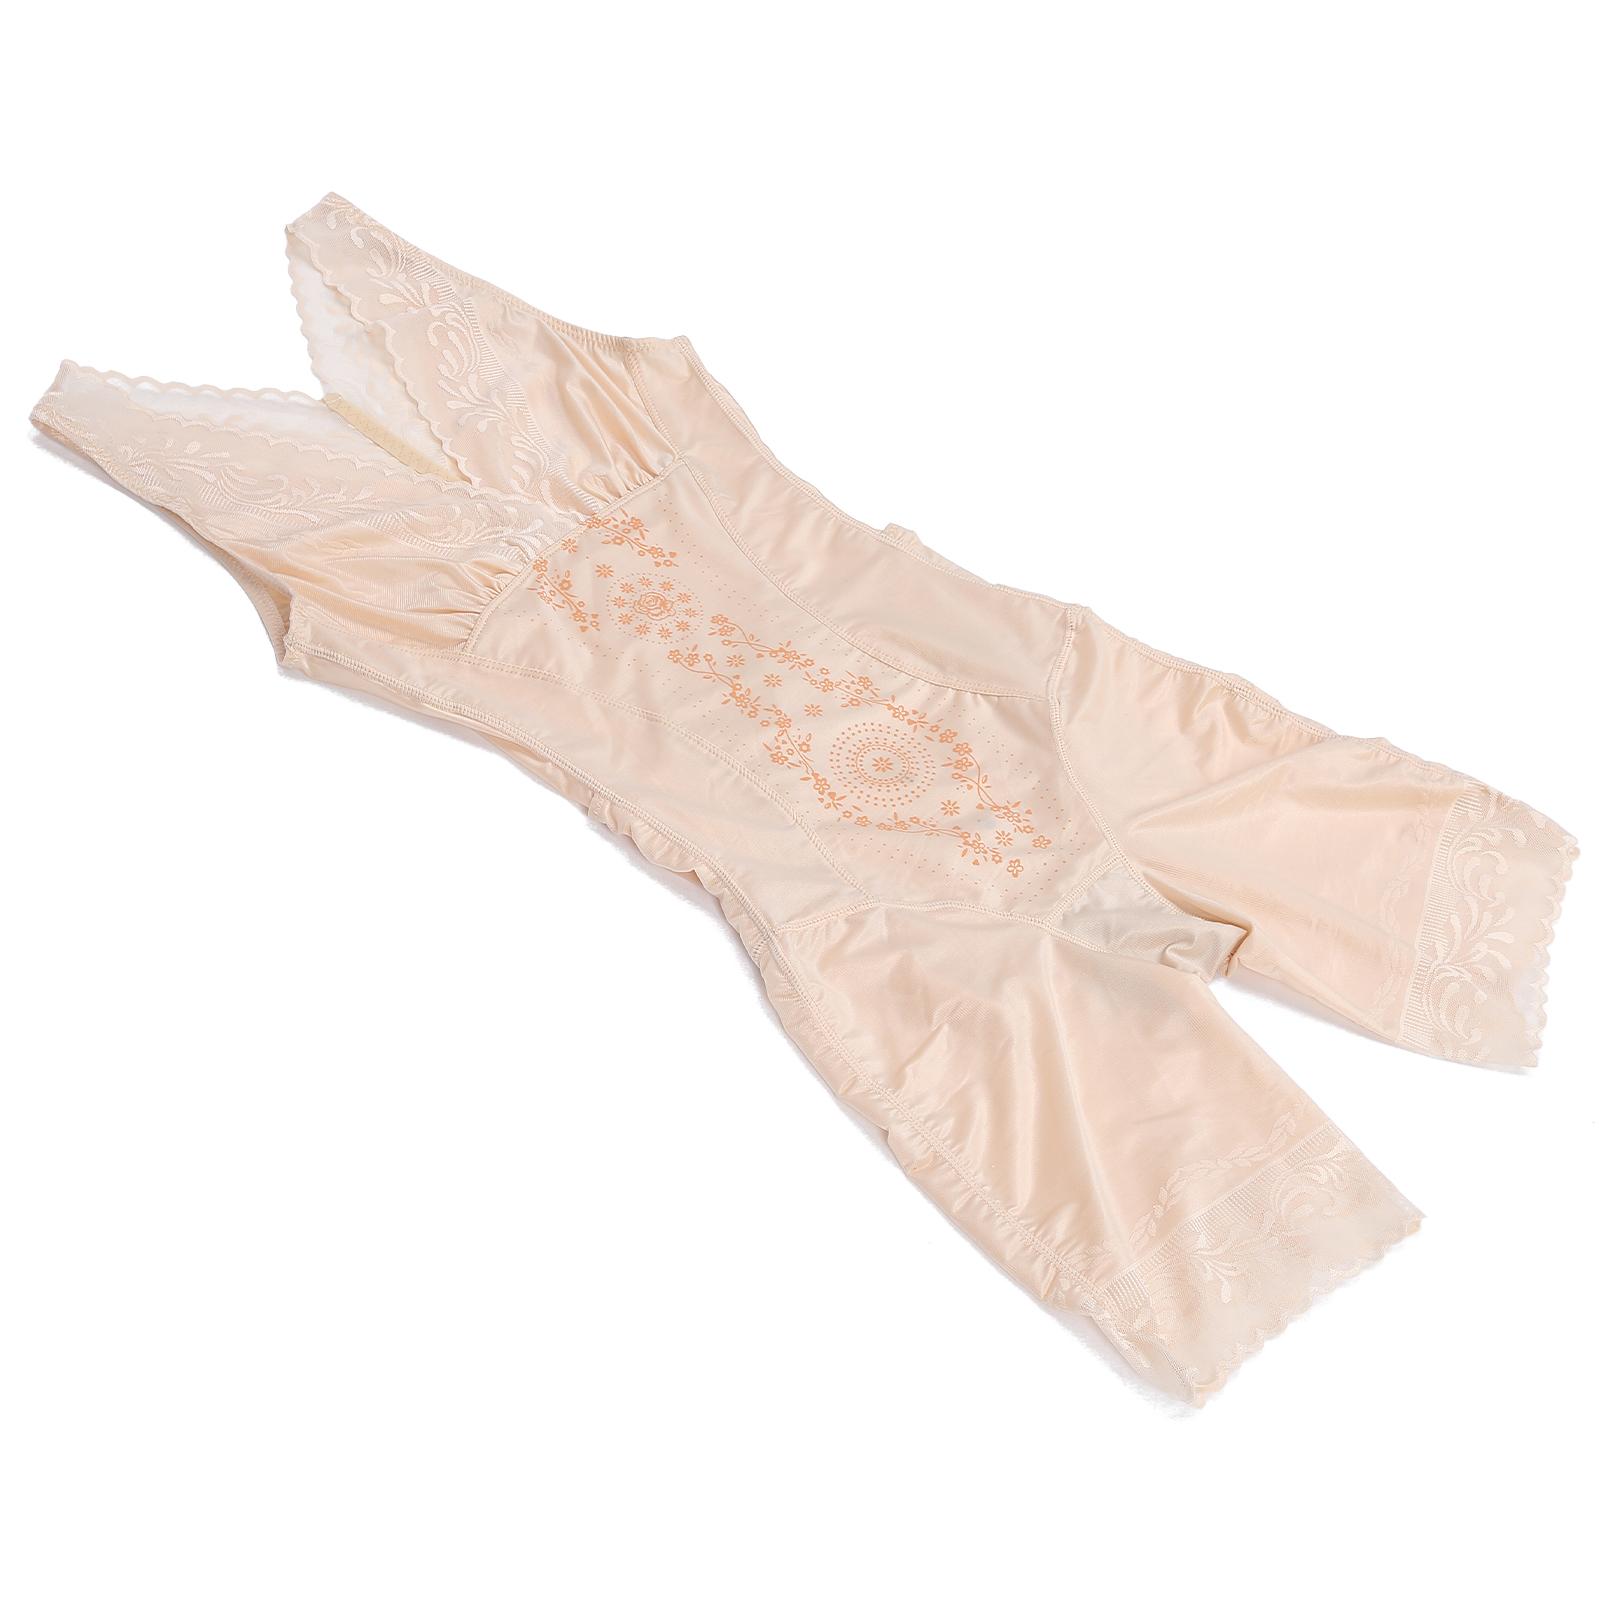 miniature 14 - Women's Full Body Taille Trainer Shaper Taille Corset underbust corset shapewear